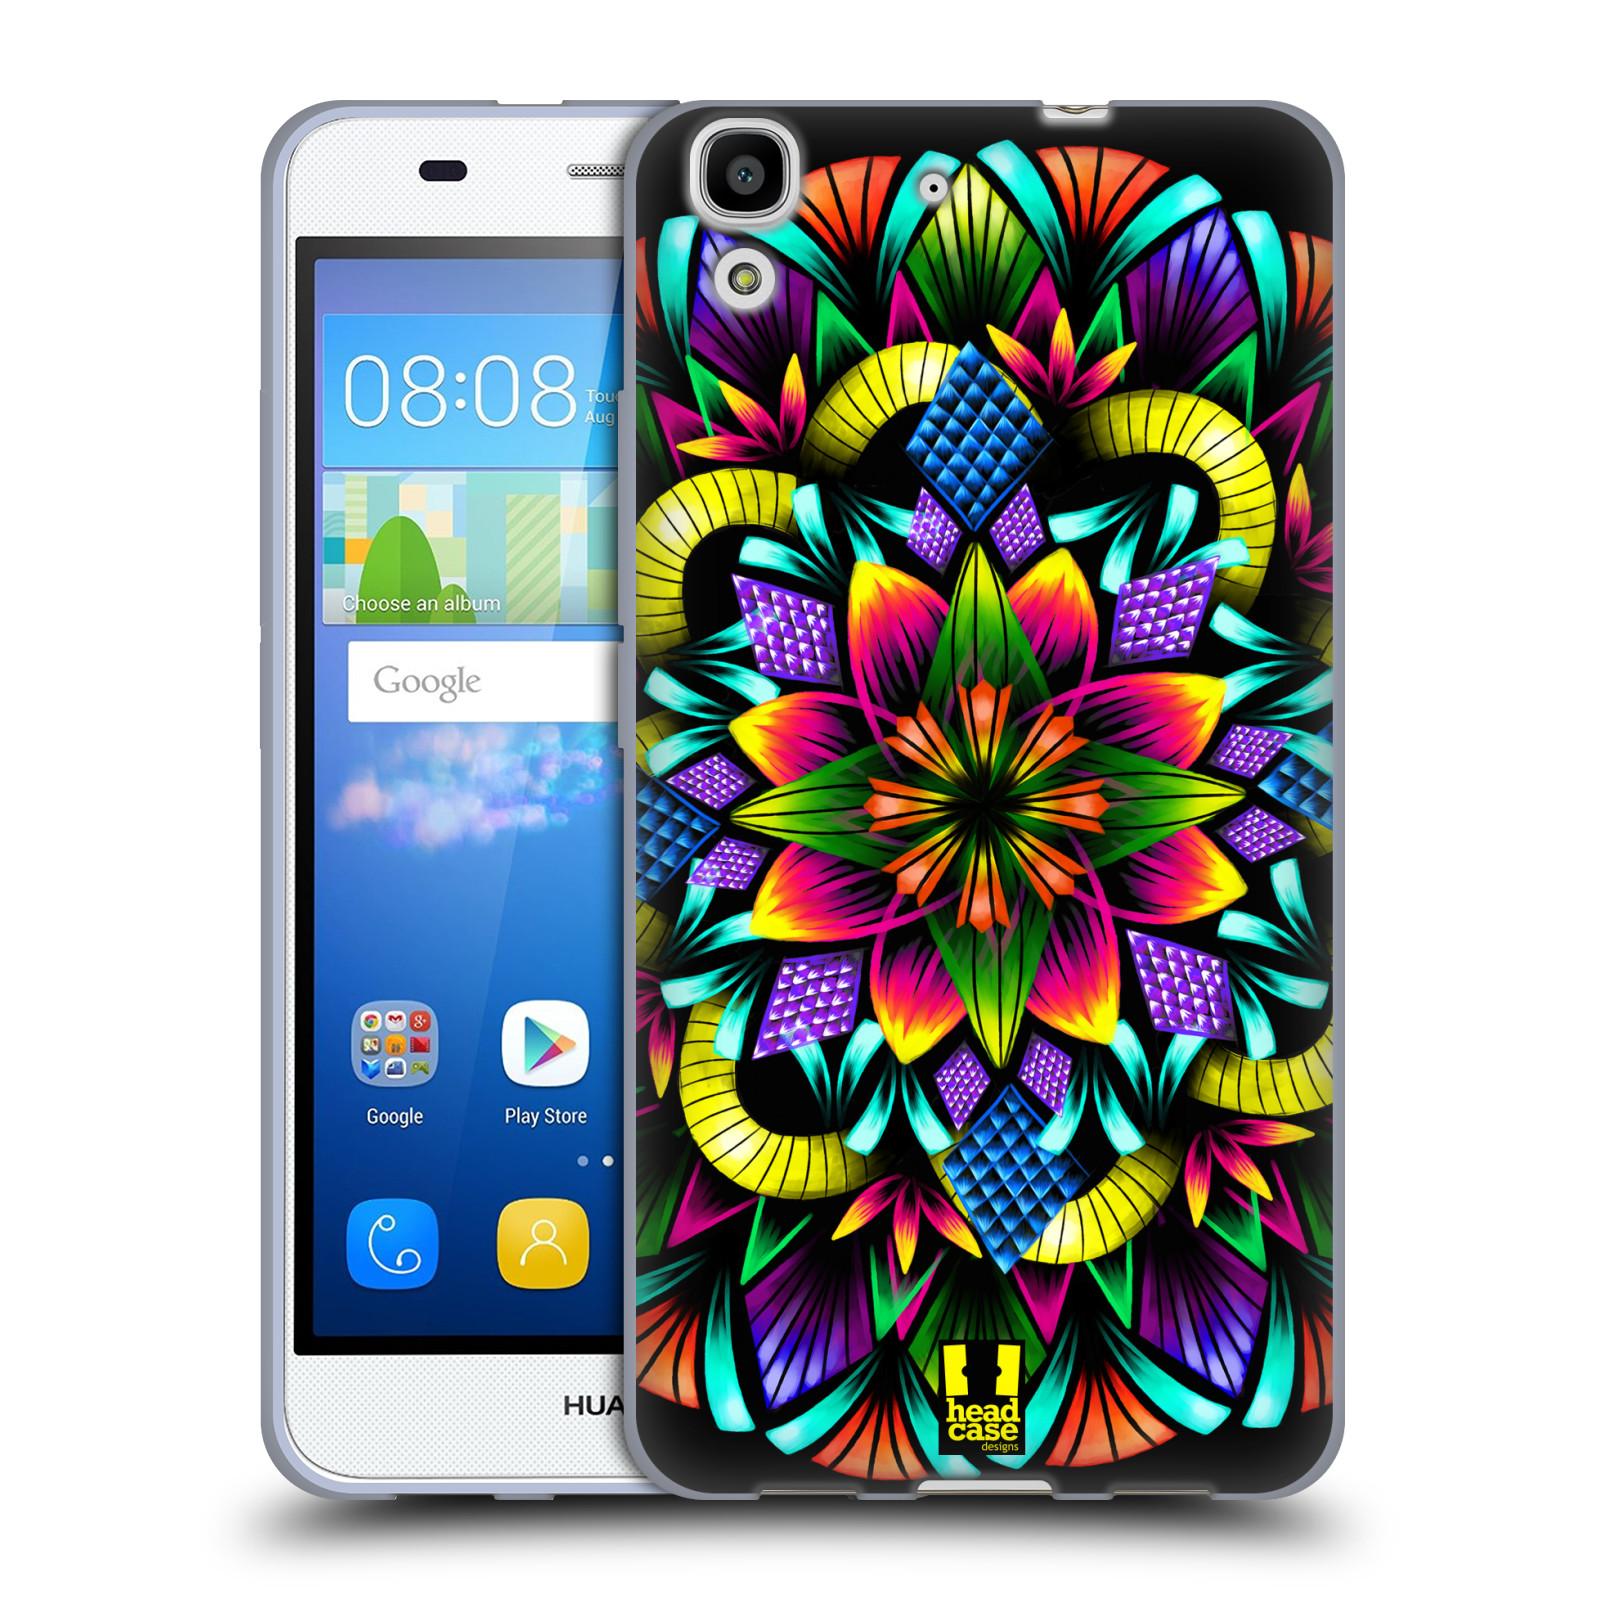 b8f22da25 Silikonové pouzdro na mobil Huawei Y6 HEAD CASE Květina mandala ...